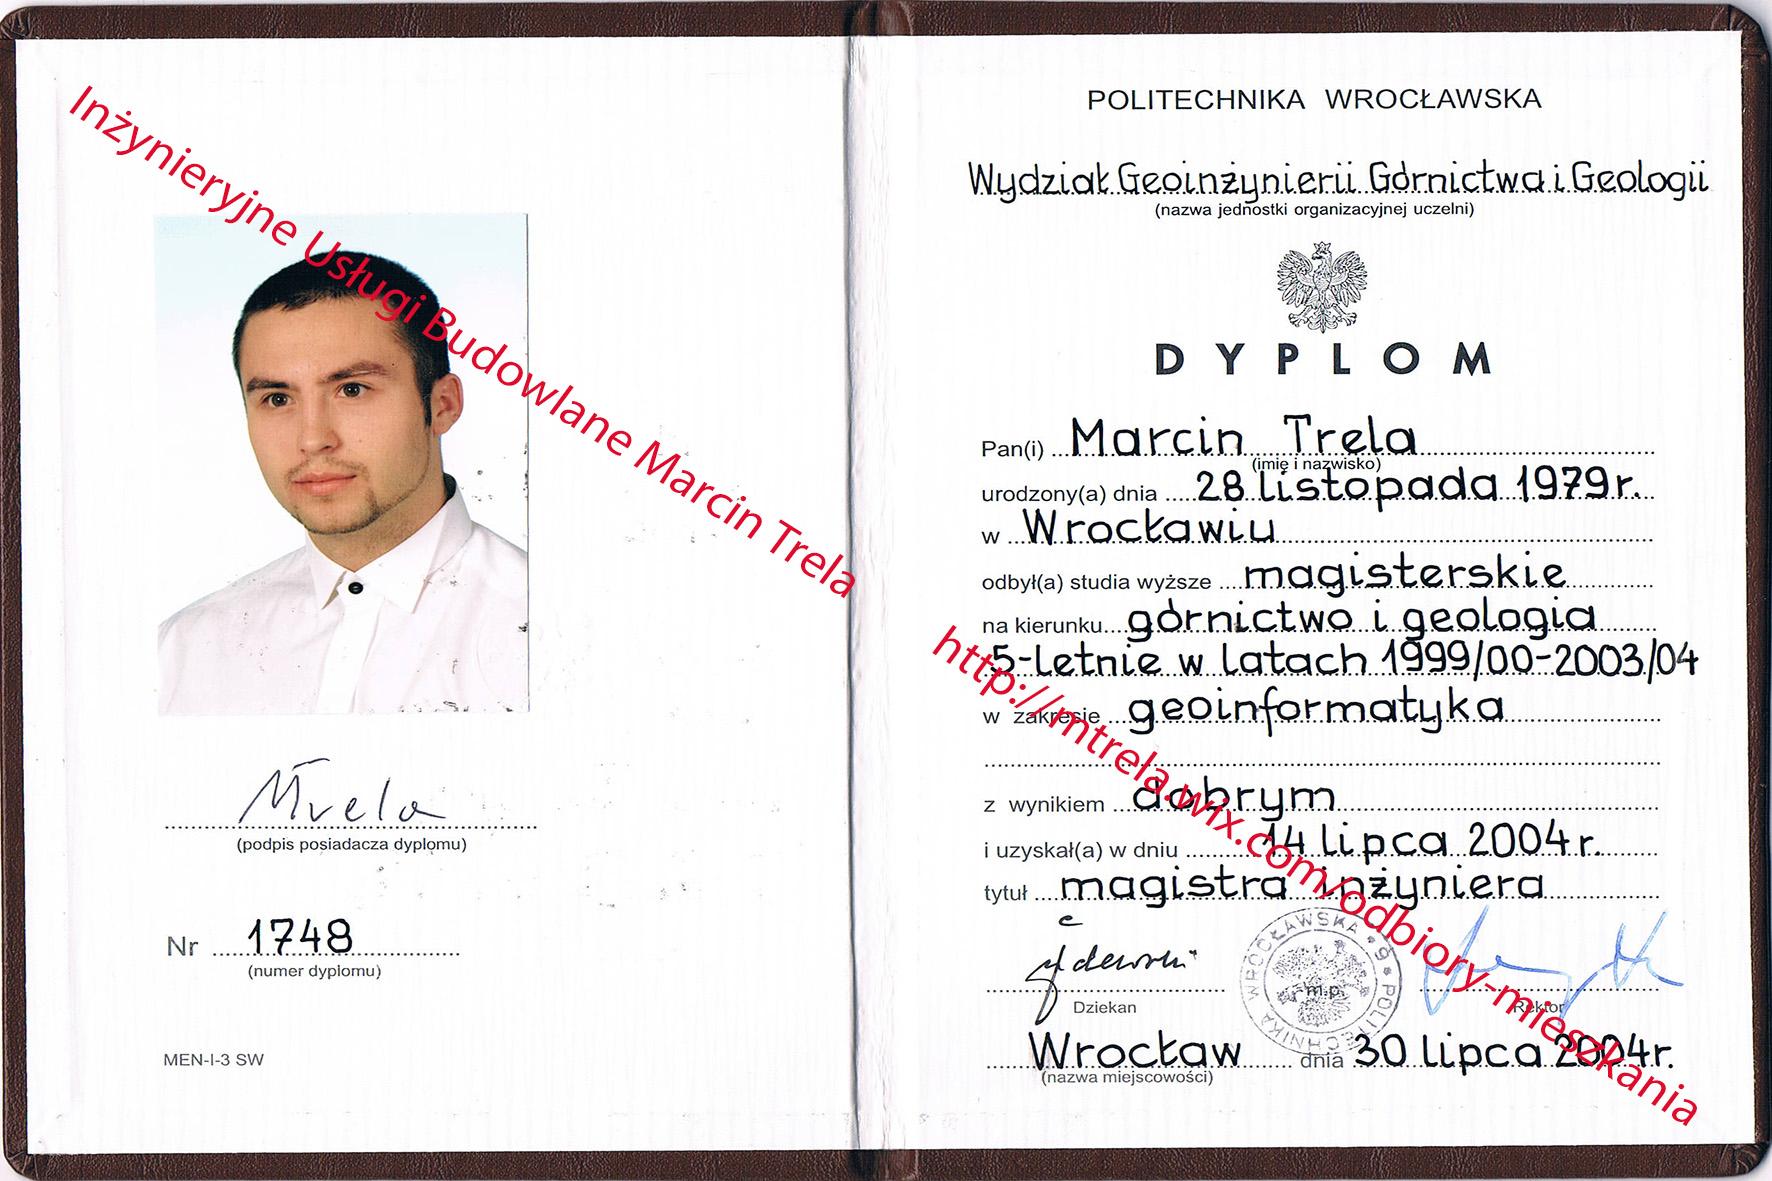 Dyplom_mgr_inz_mtrela_odbiory_mieszkań.jpg